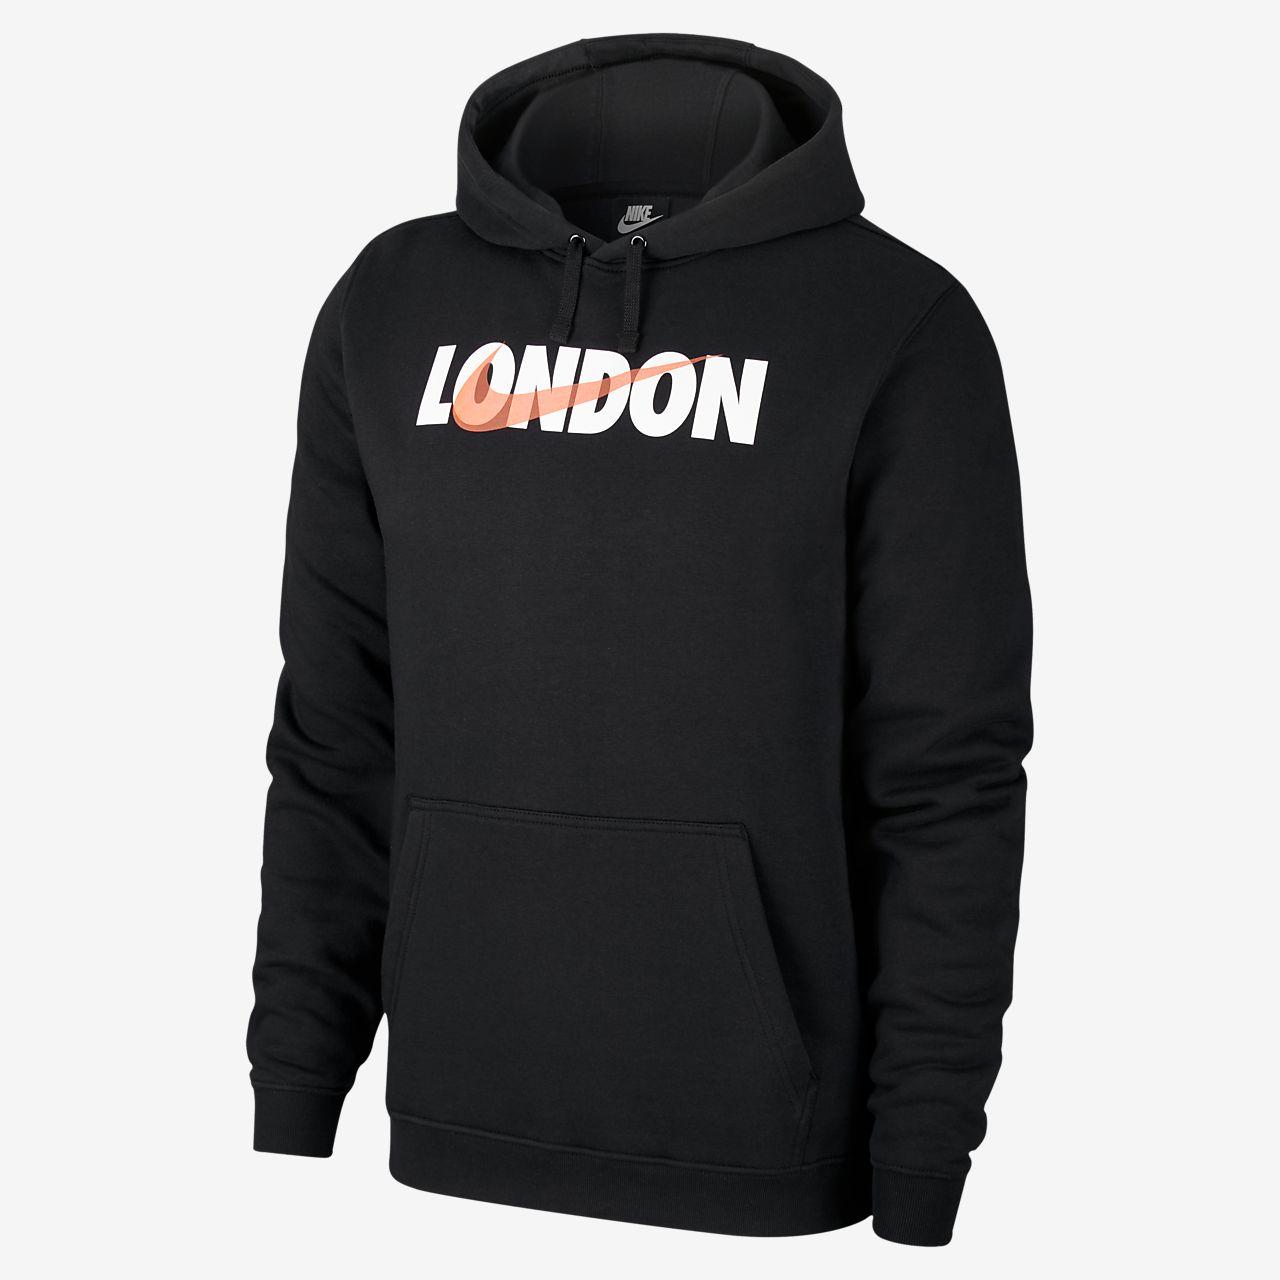 Nike Sportswear Club Fleece (London) Herren Hoodie mit Print